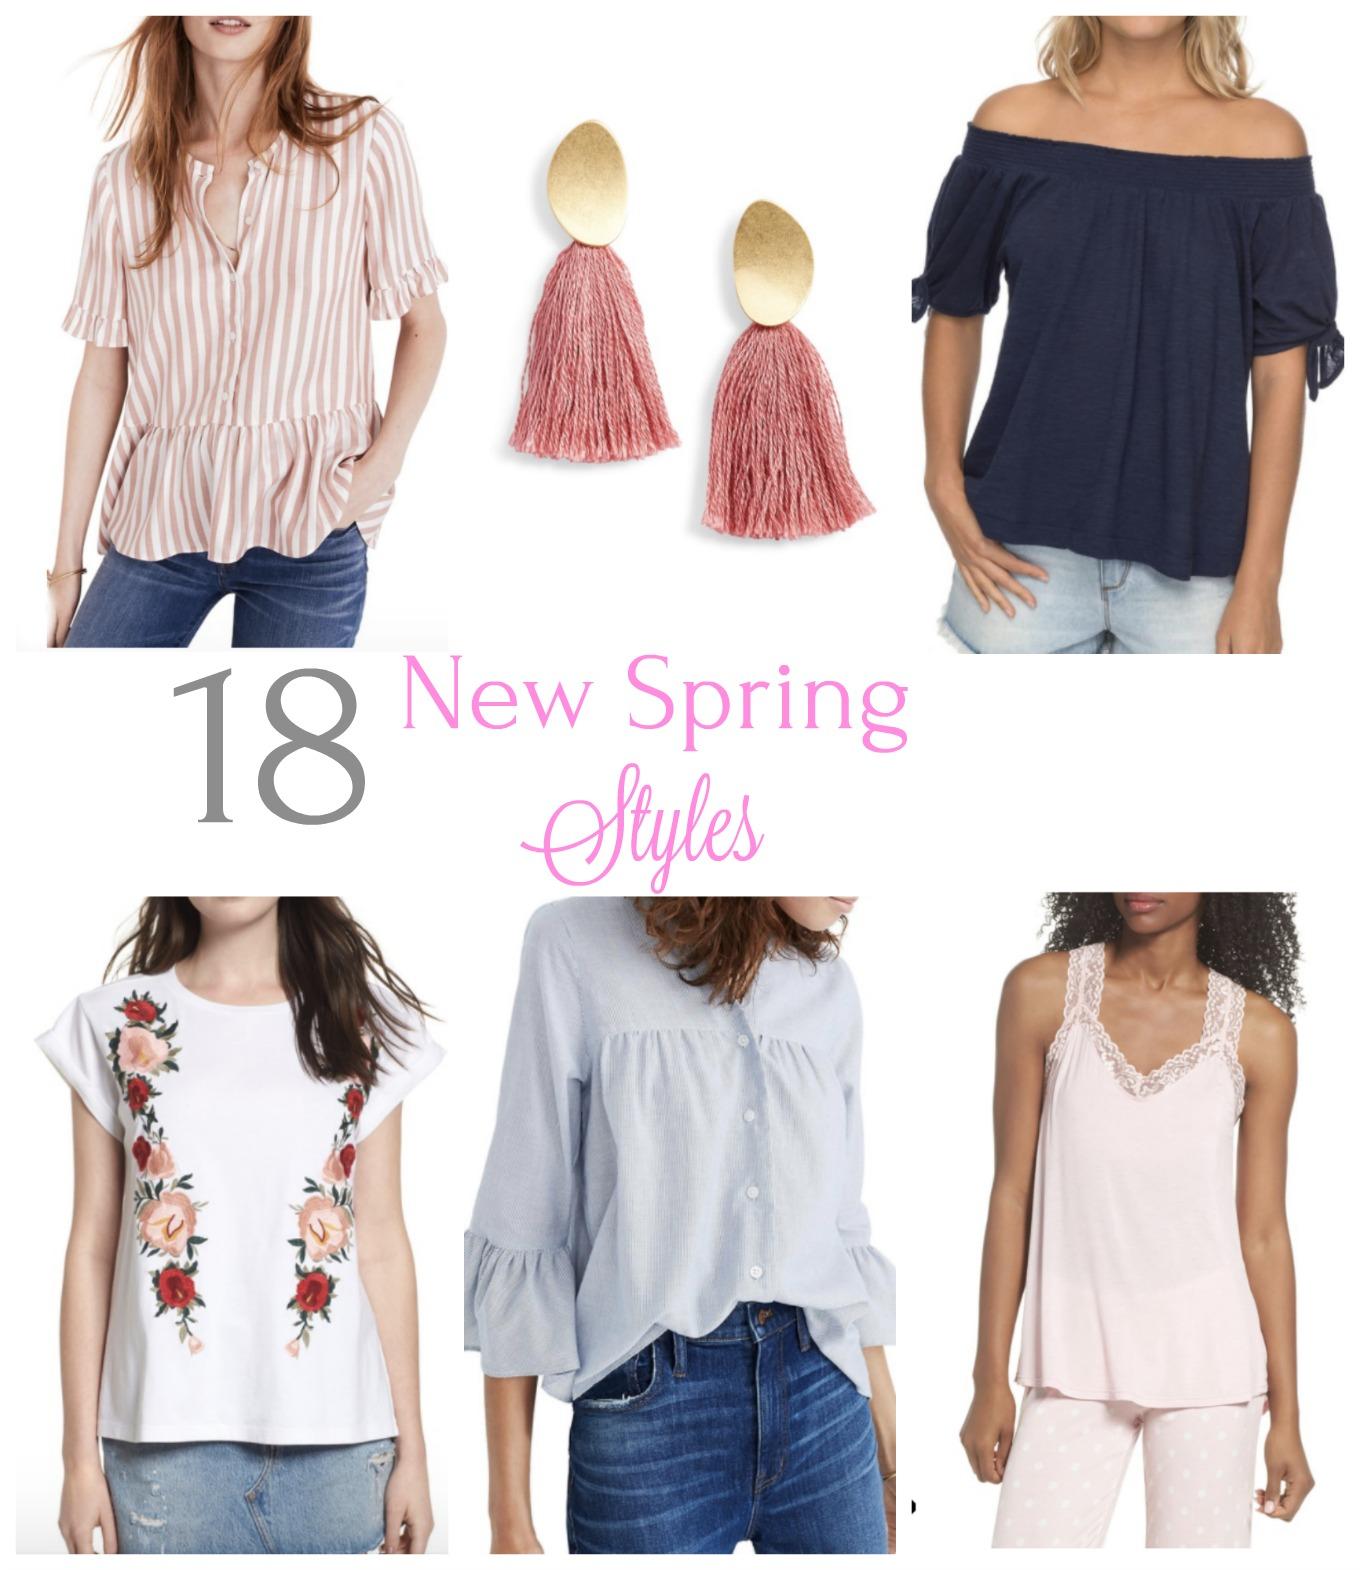 5 New Spring Styles - Cyndi Spivey